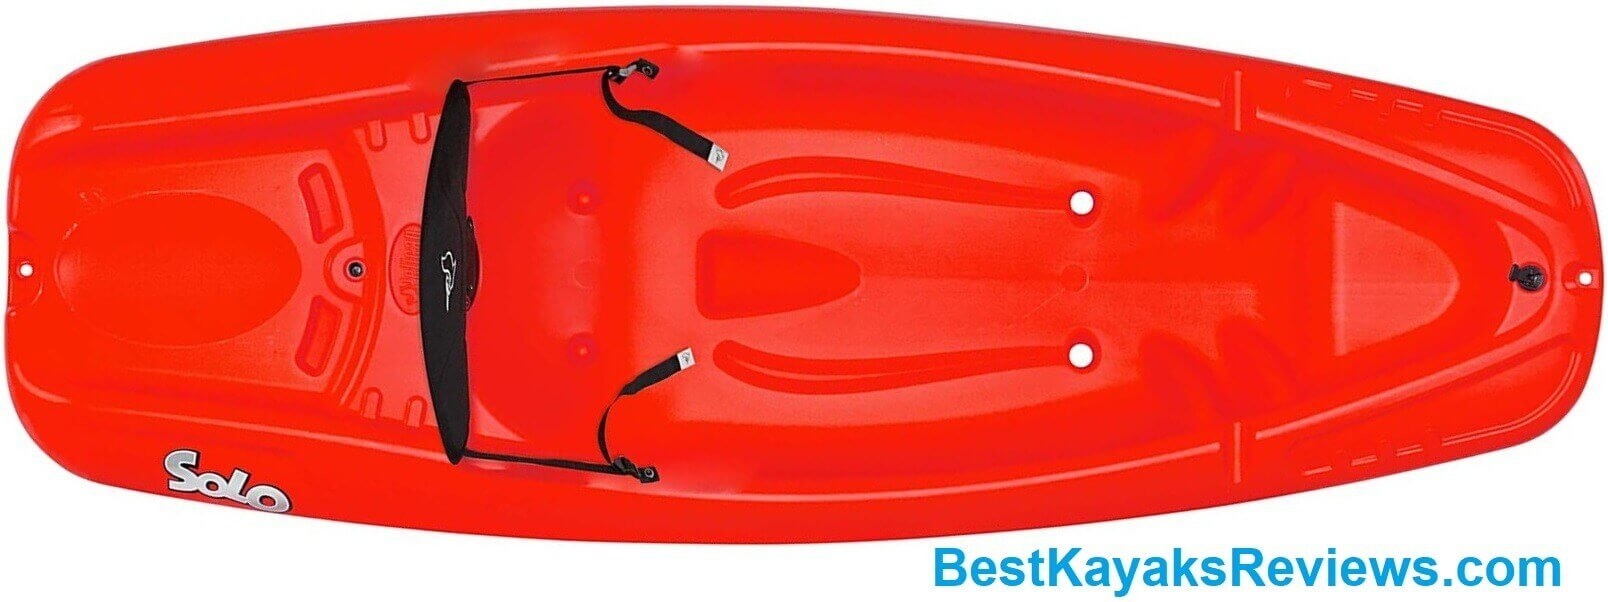 Pelican Solo Sit-on-top Youth Kid Kayak